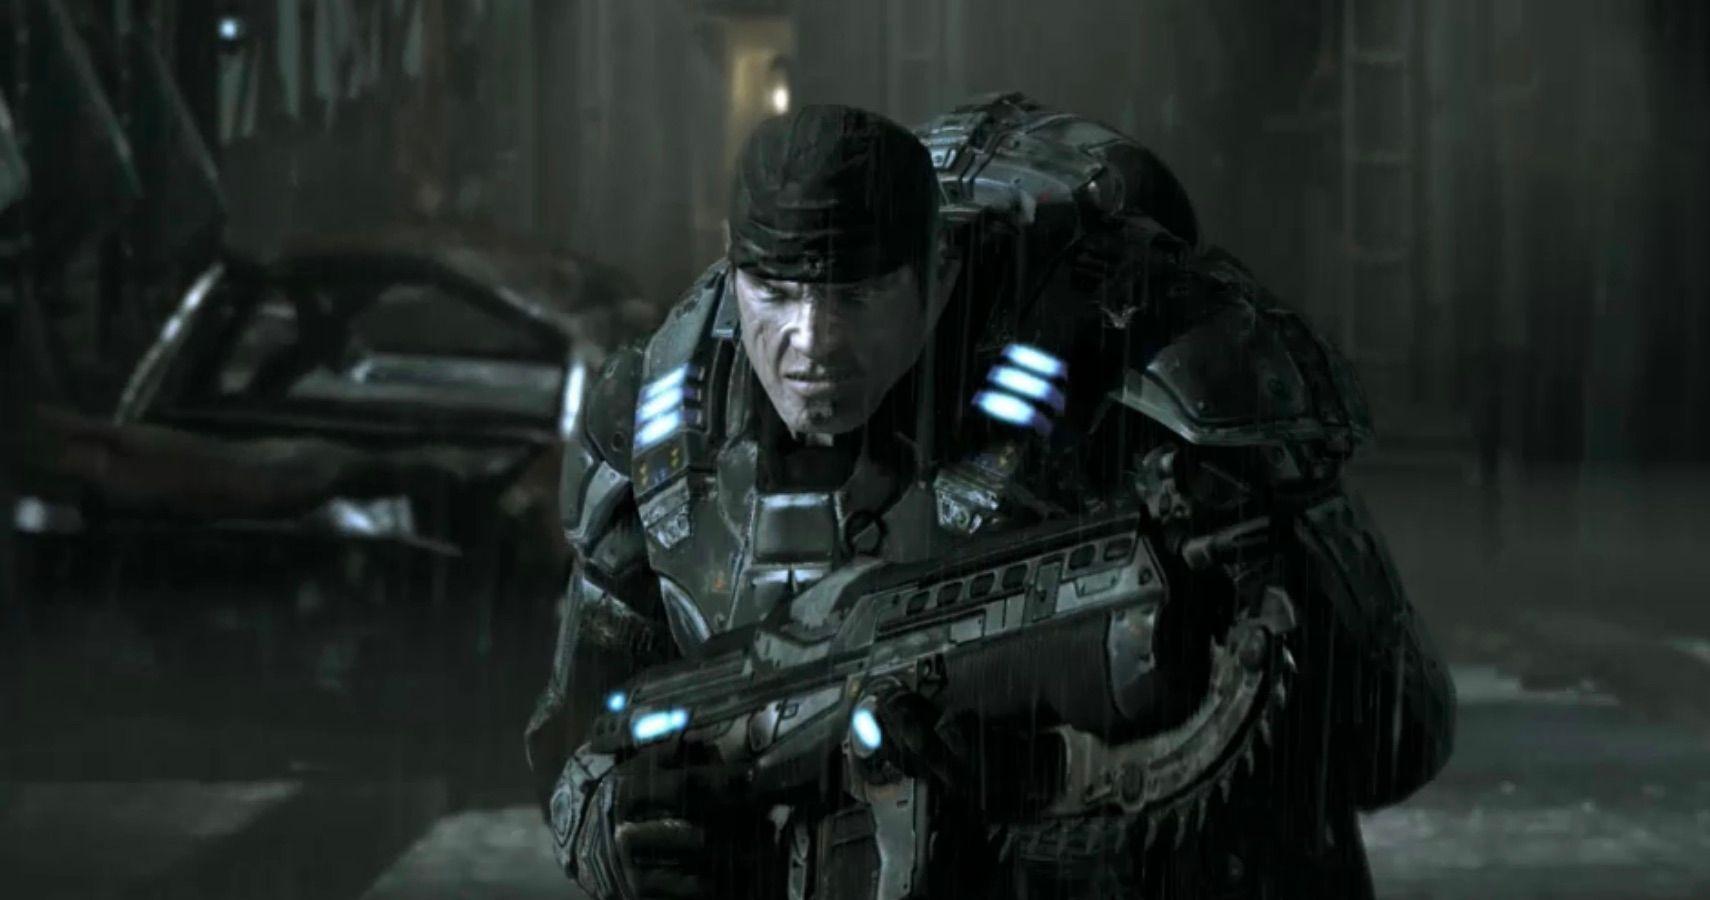 www.thegamer.com